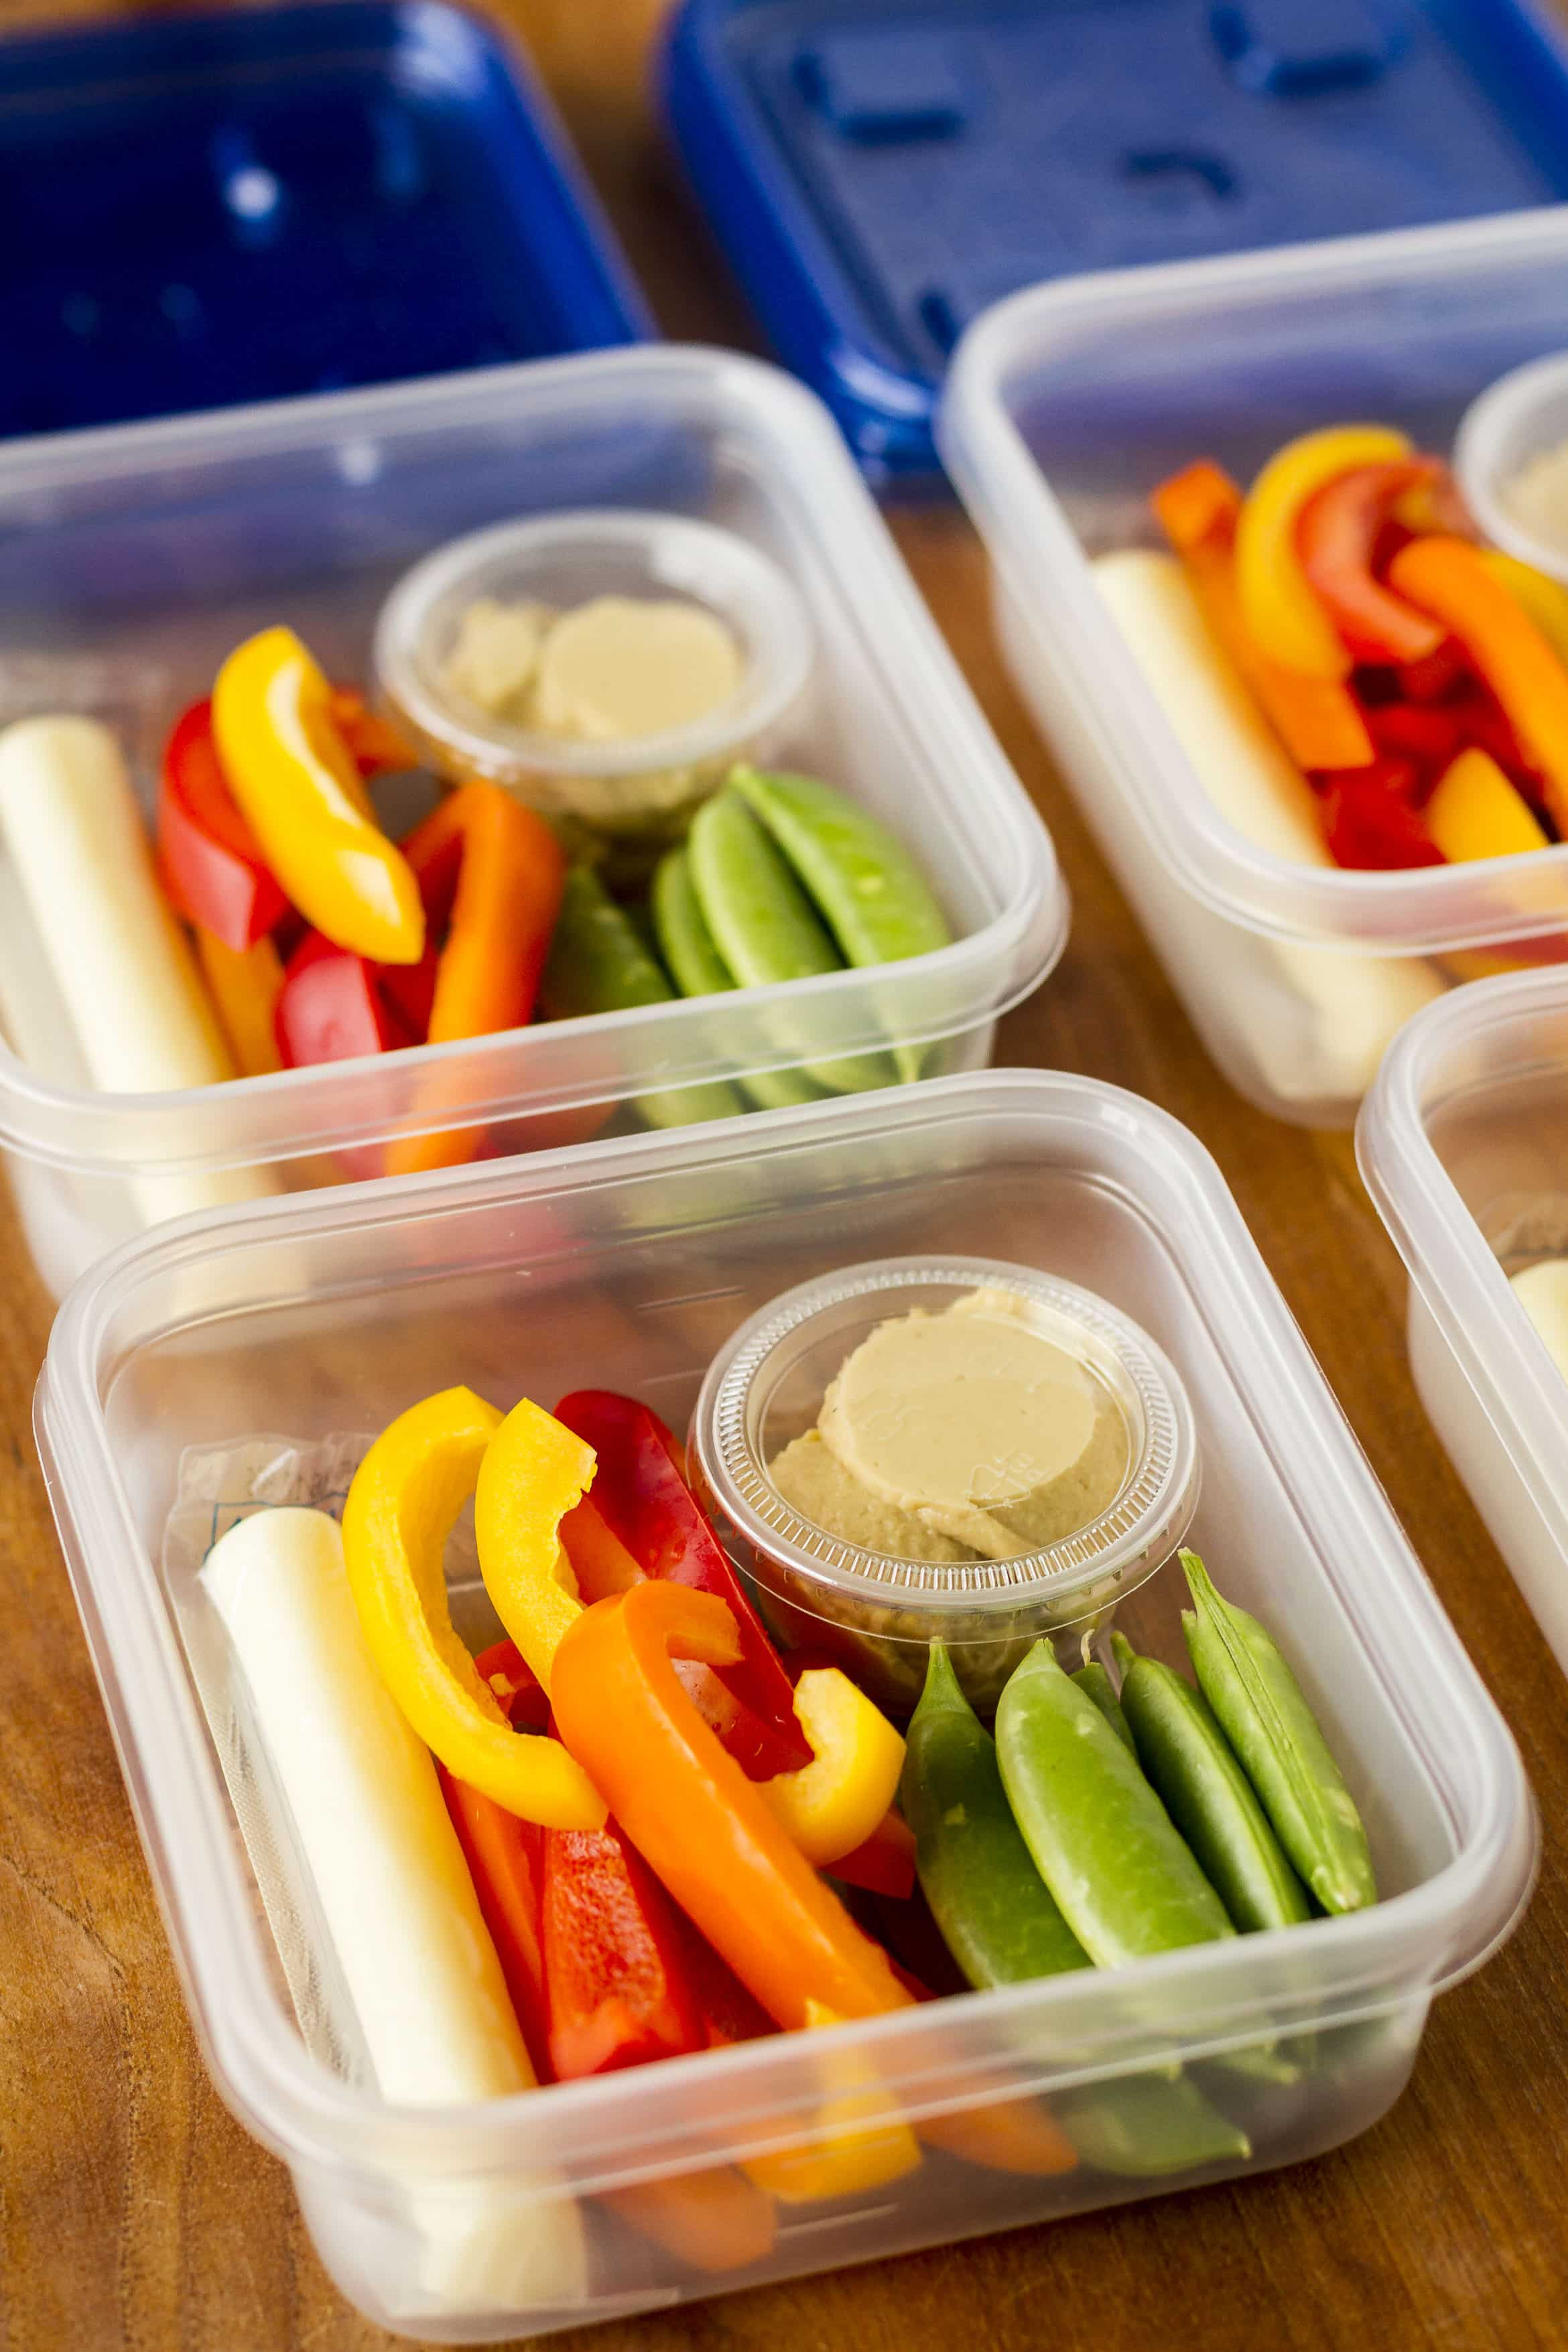 simple veggies & hummus snack idea for meal prep